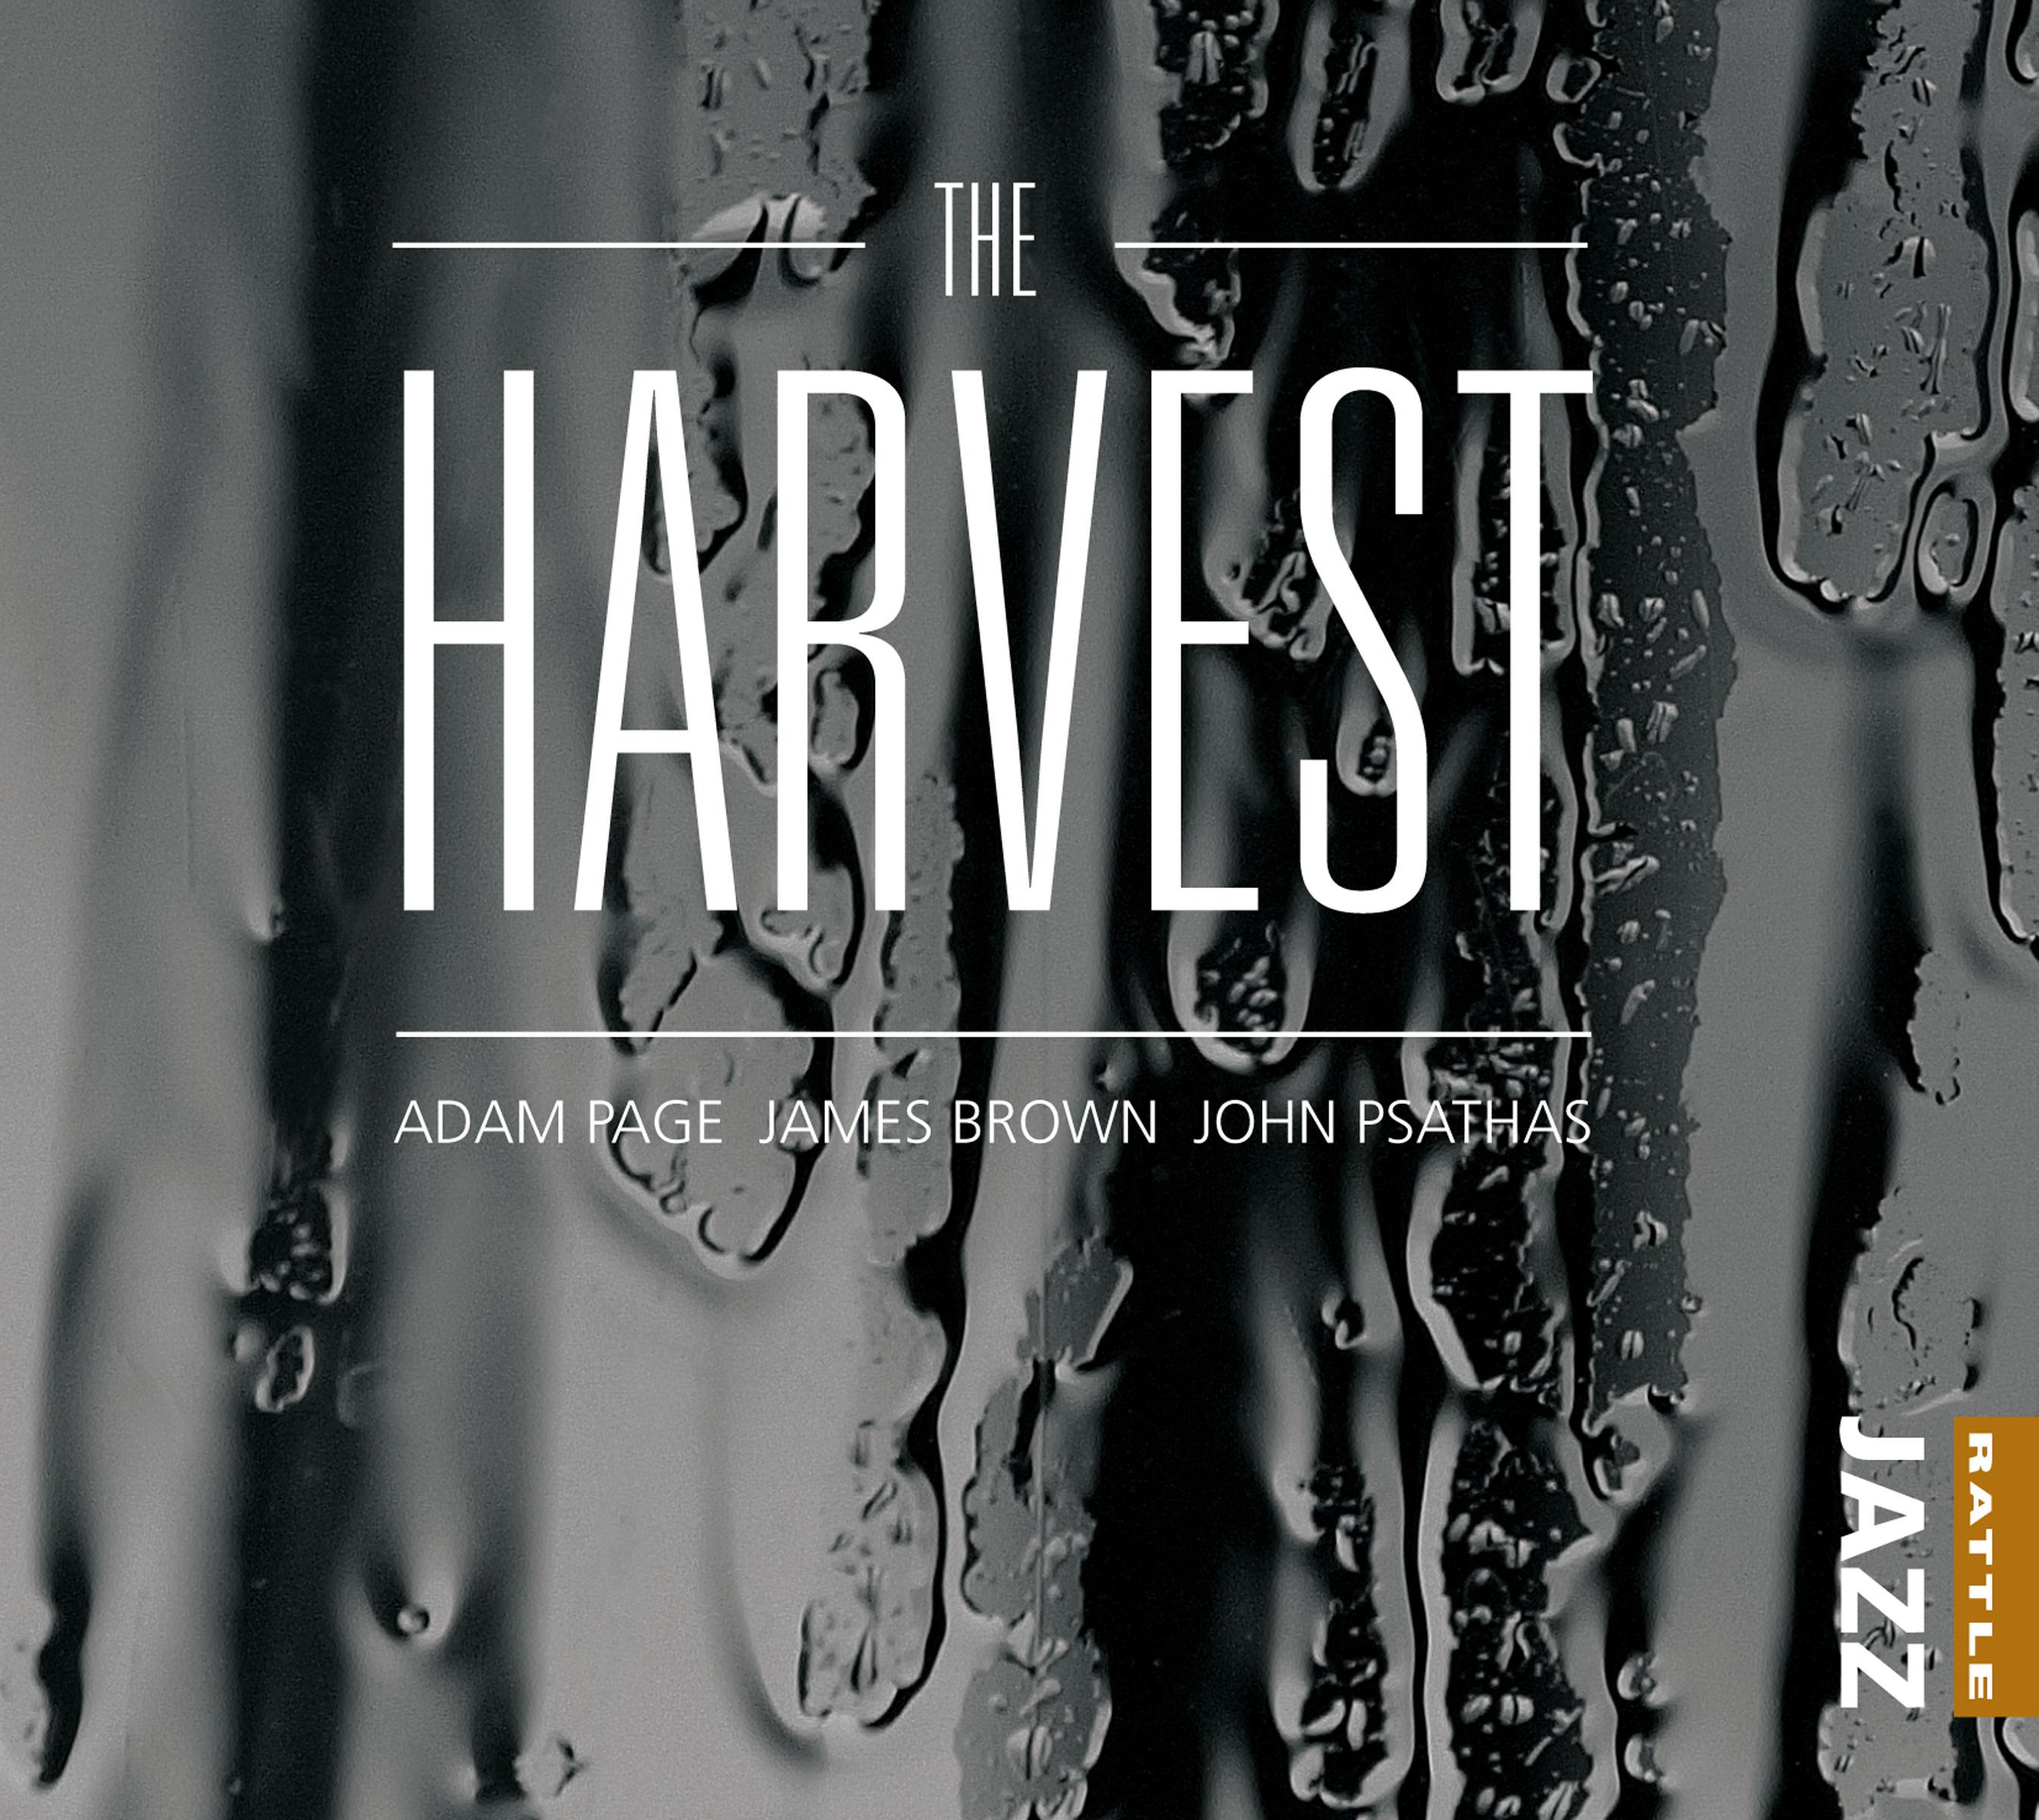 Adam Page, James Brown, John Psathas | The Harvest - downloadable MP3 ALBUM